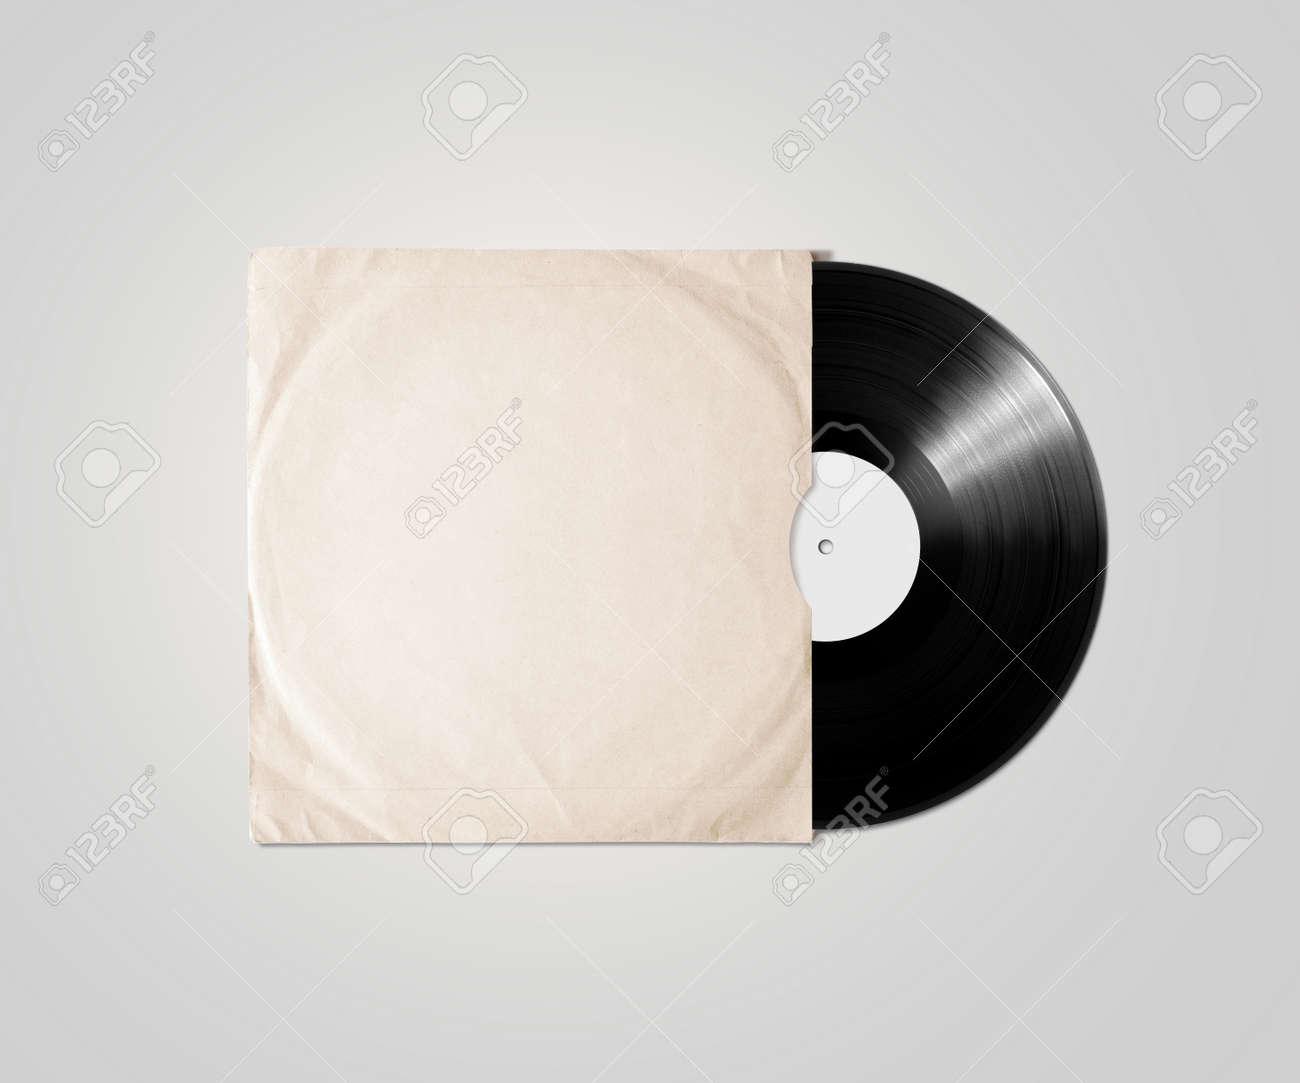 Blank Vinyl Album Cover Sleeve Mockup, Isolated. Gramophone Music ...